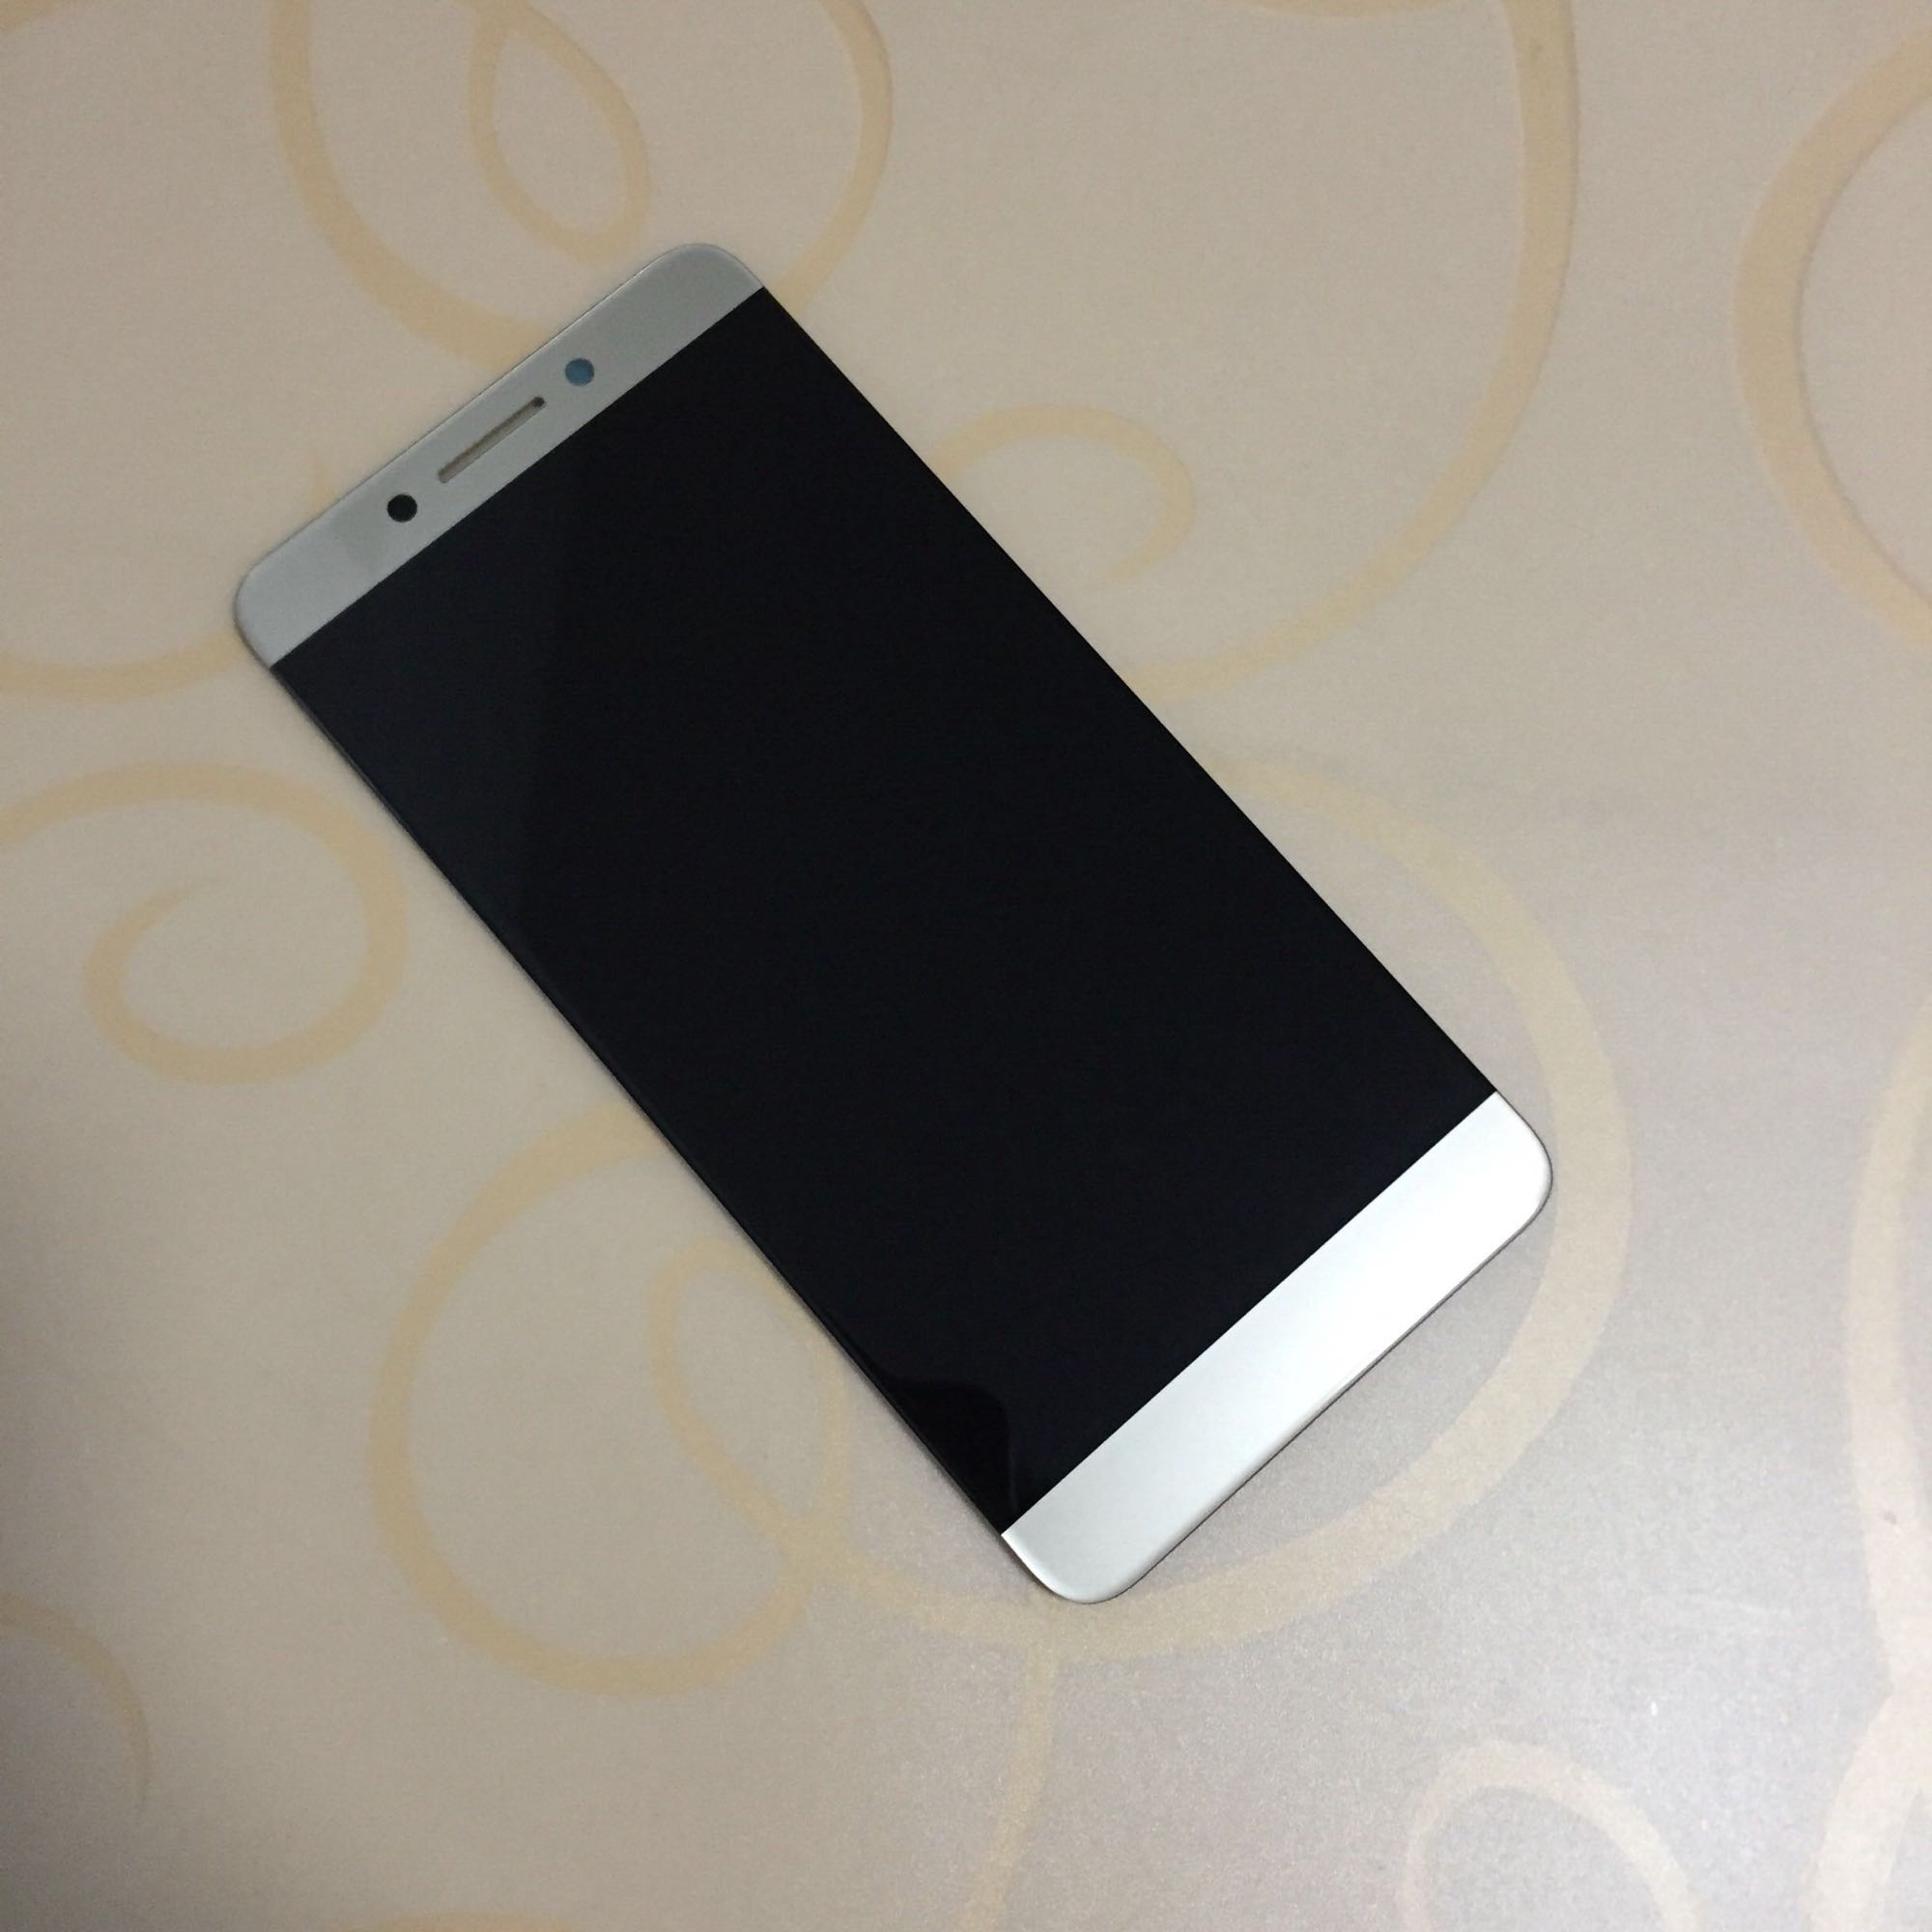 For LeTV LeEco Le3 Le 3 lePro3 AI X650 X653 X651 X656 X658 X659 Touch Screen